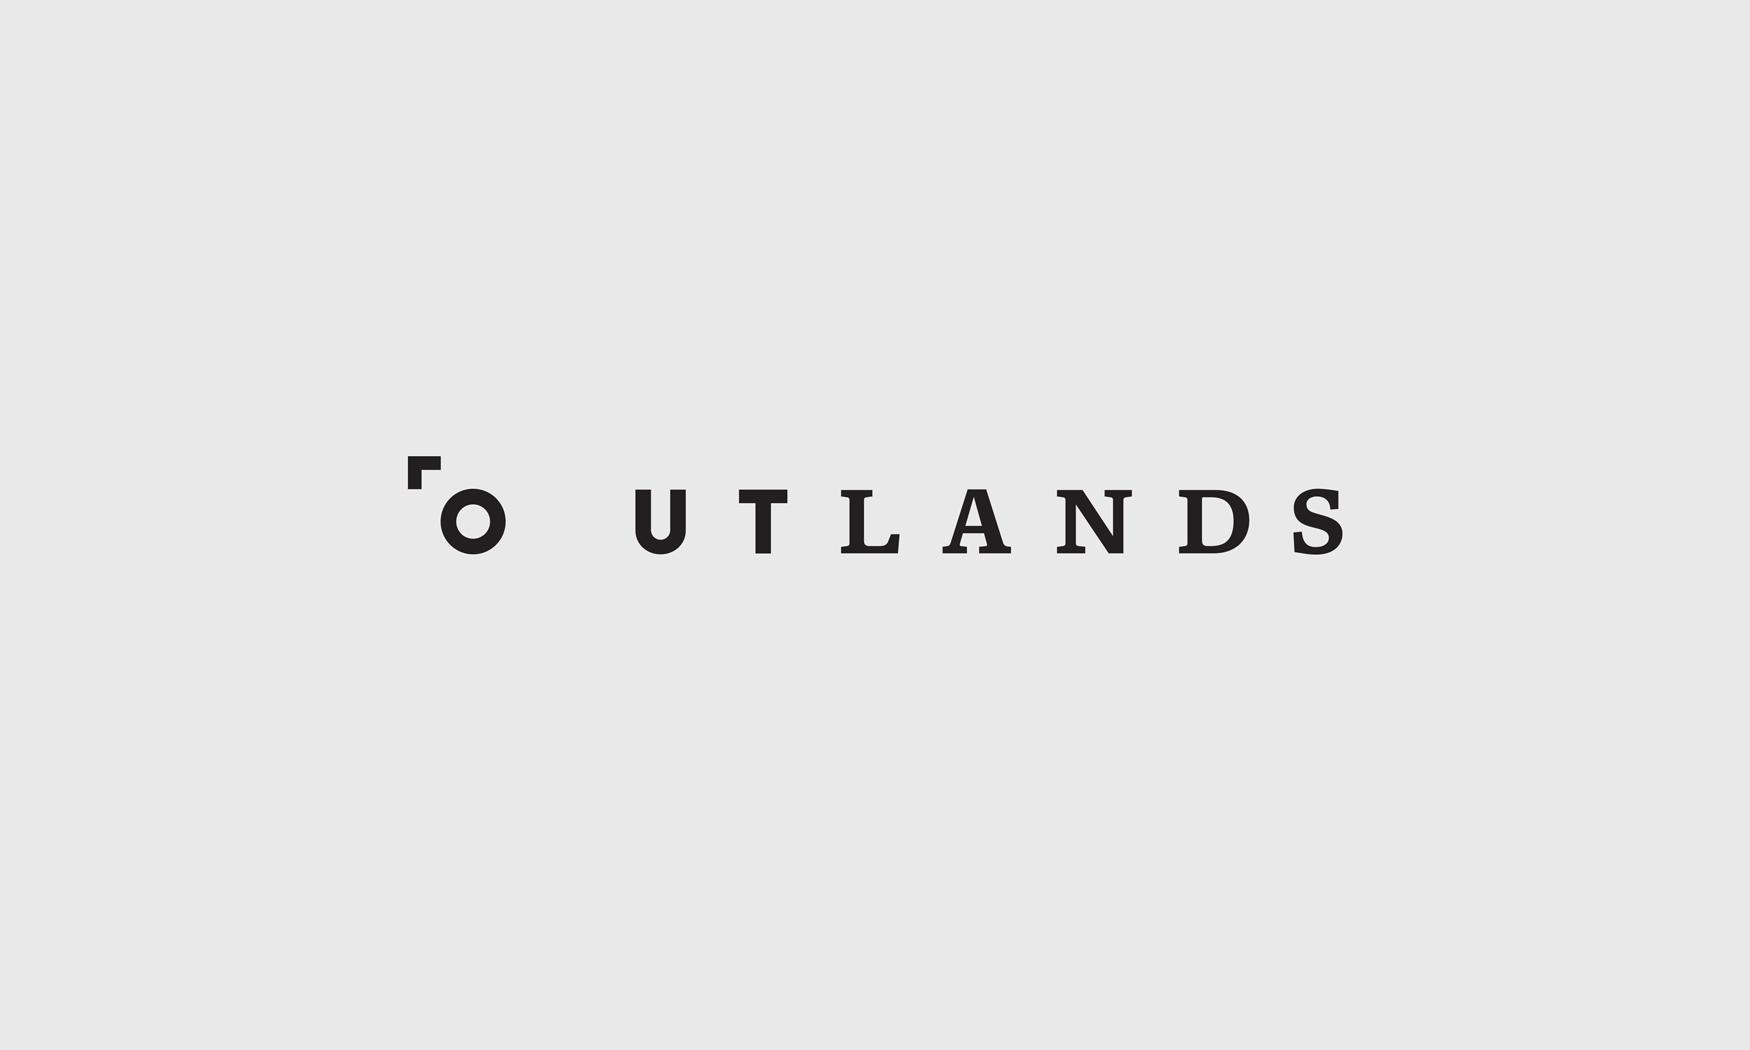 Outlands_logo.jpg